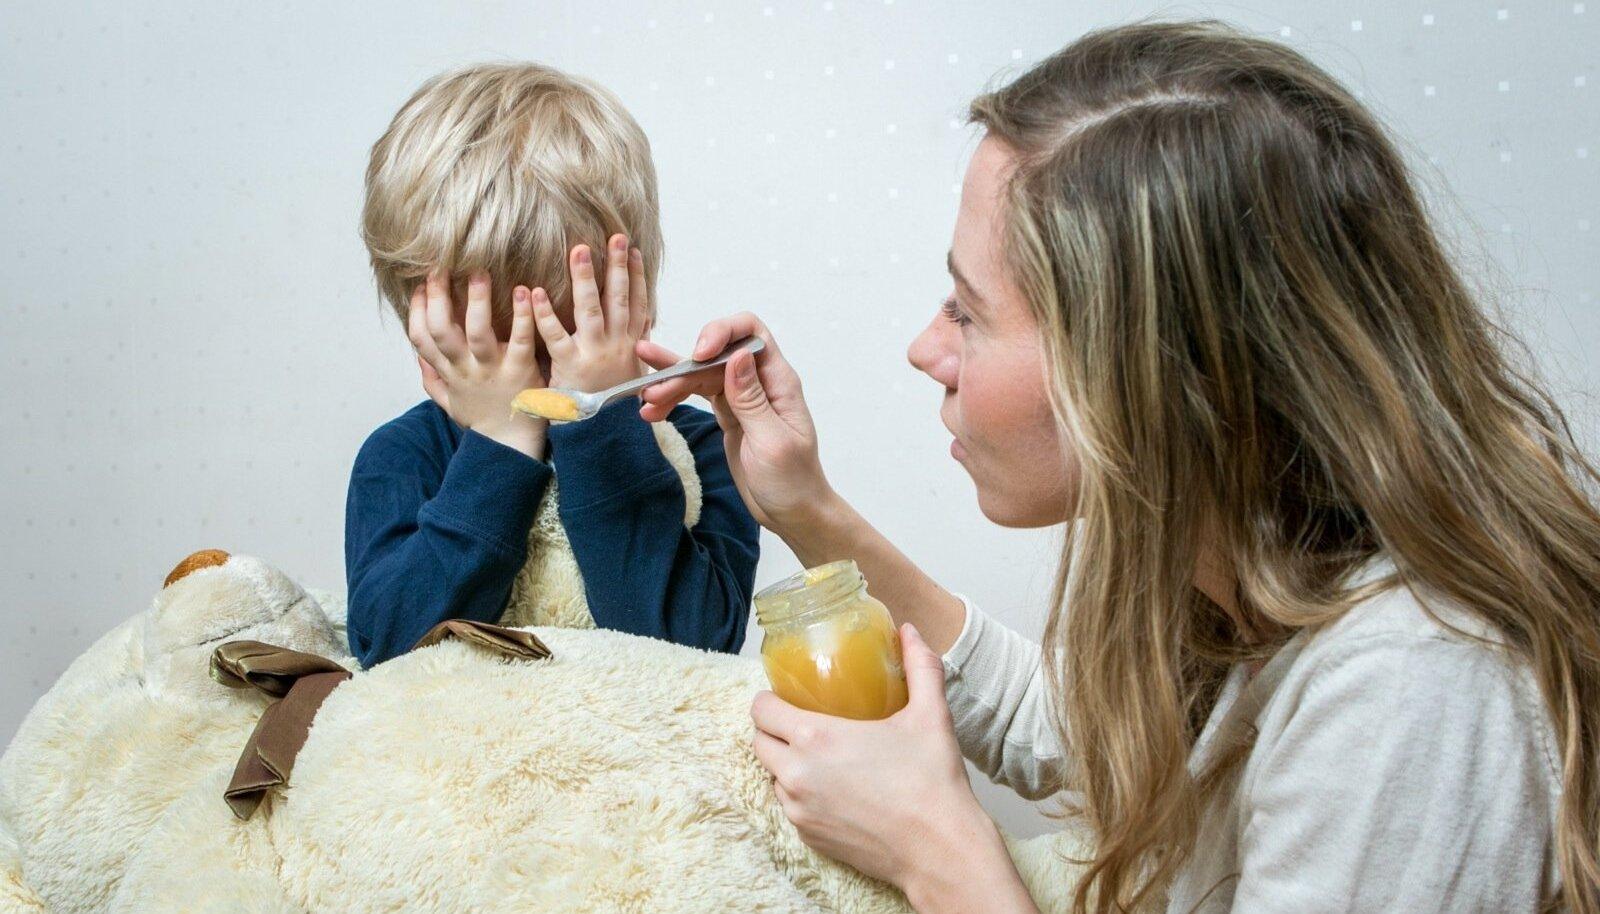 Laps on haige: illustratiivne pilt